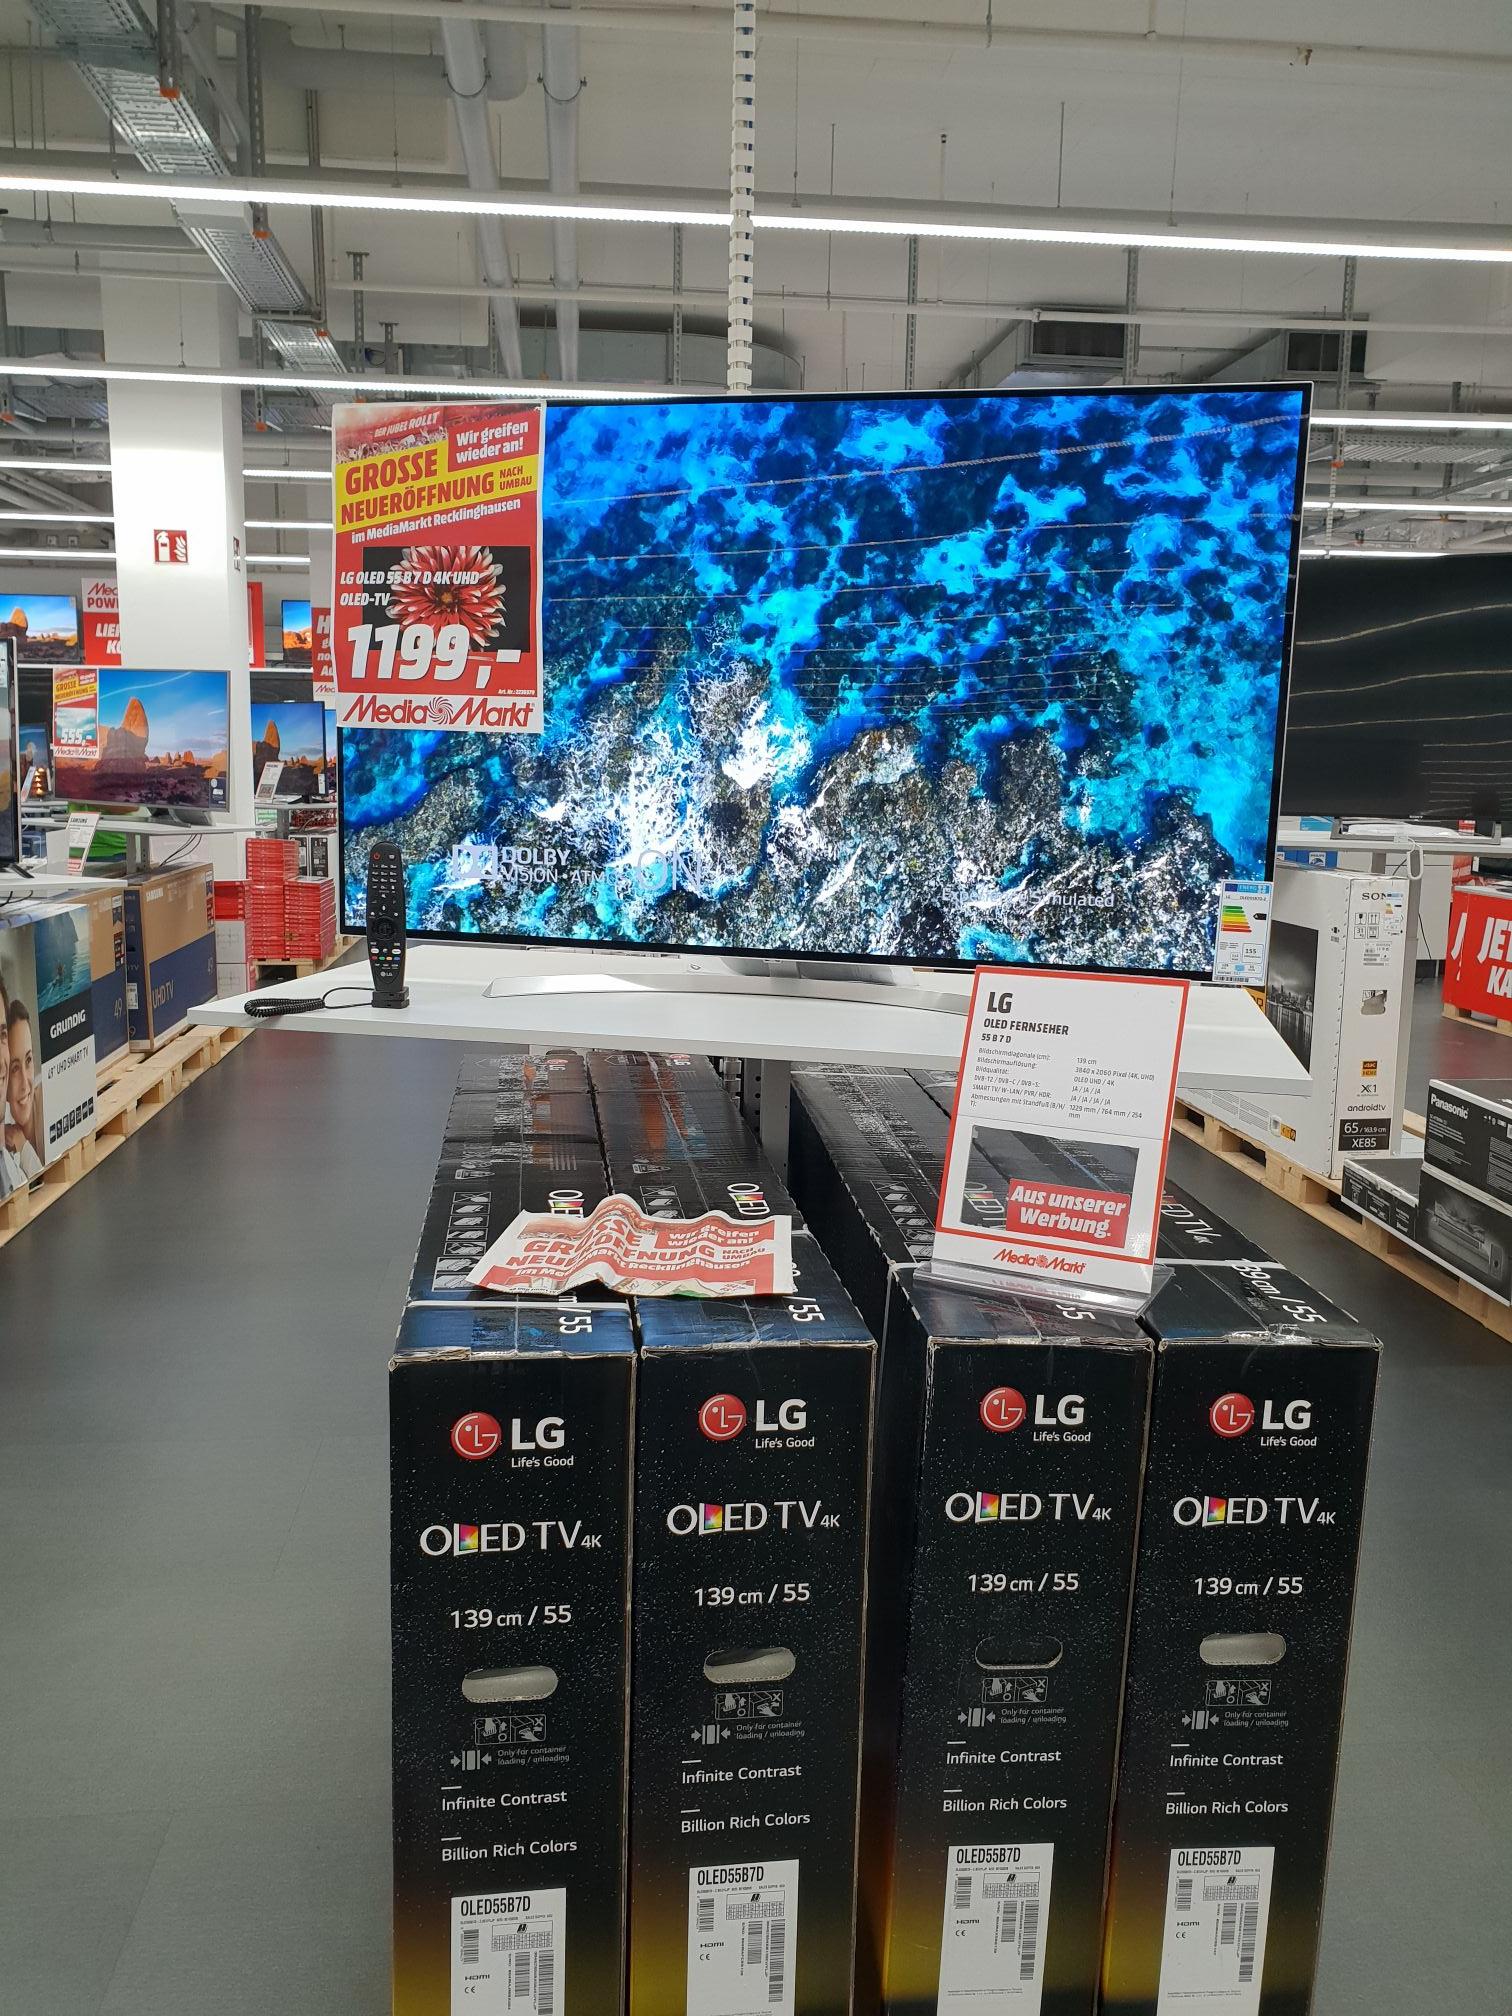 LG OLED 55B7D Media Markt Recklinghausen Lokal Große Neueröffnung